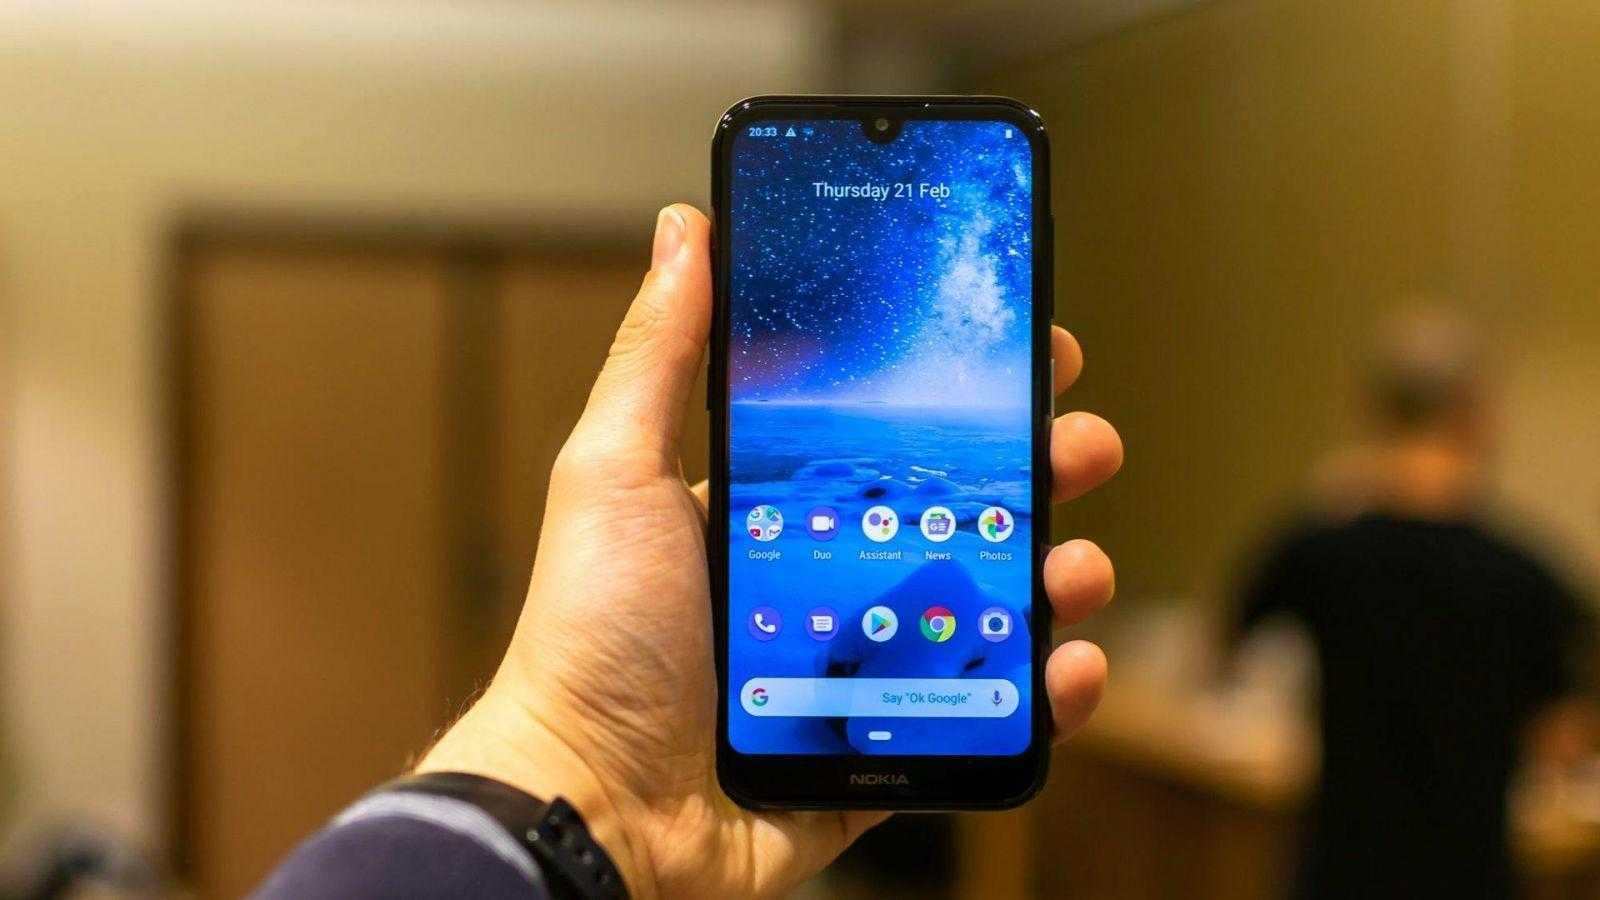 MWC 2019. Все новинки Nokia: 9 PureView, 1 Plus, 3.2, 4.2, 210 (nokia 4.2 review 3)